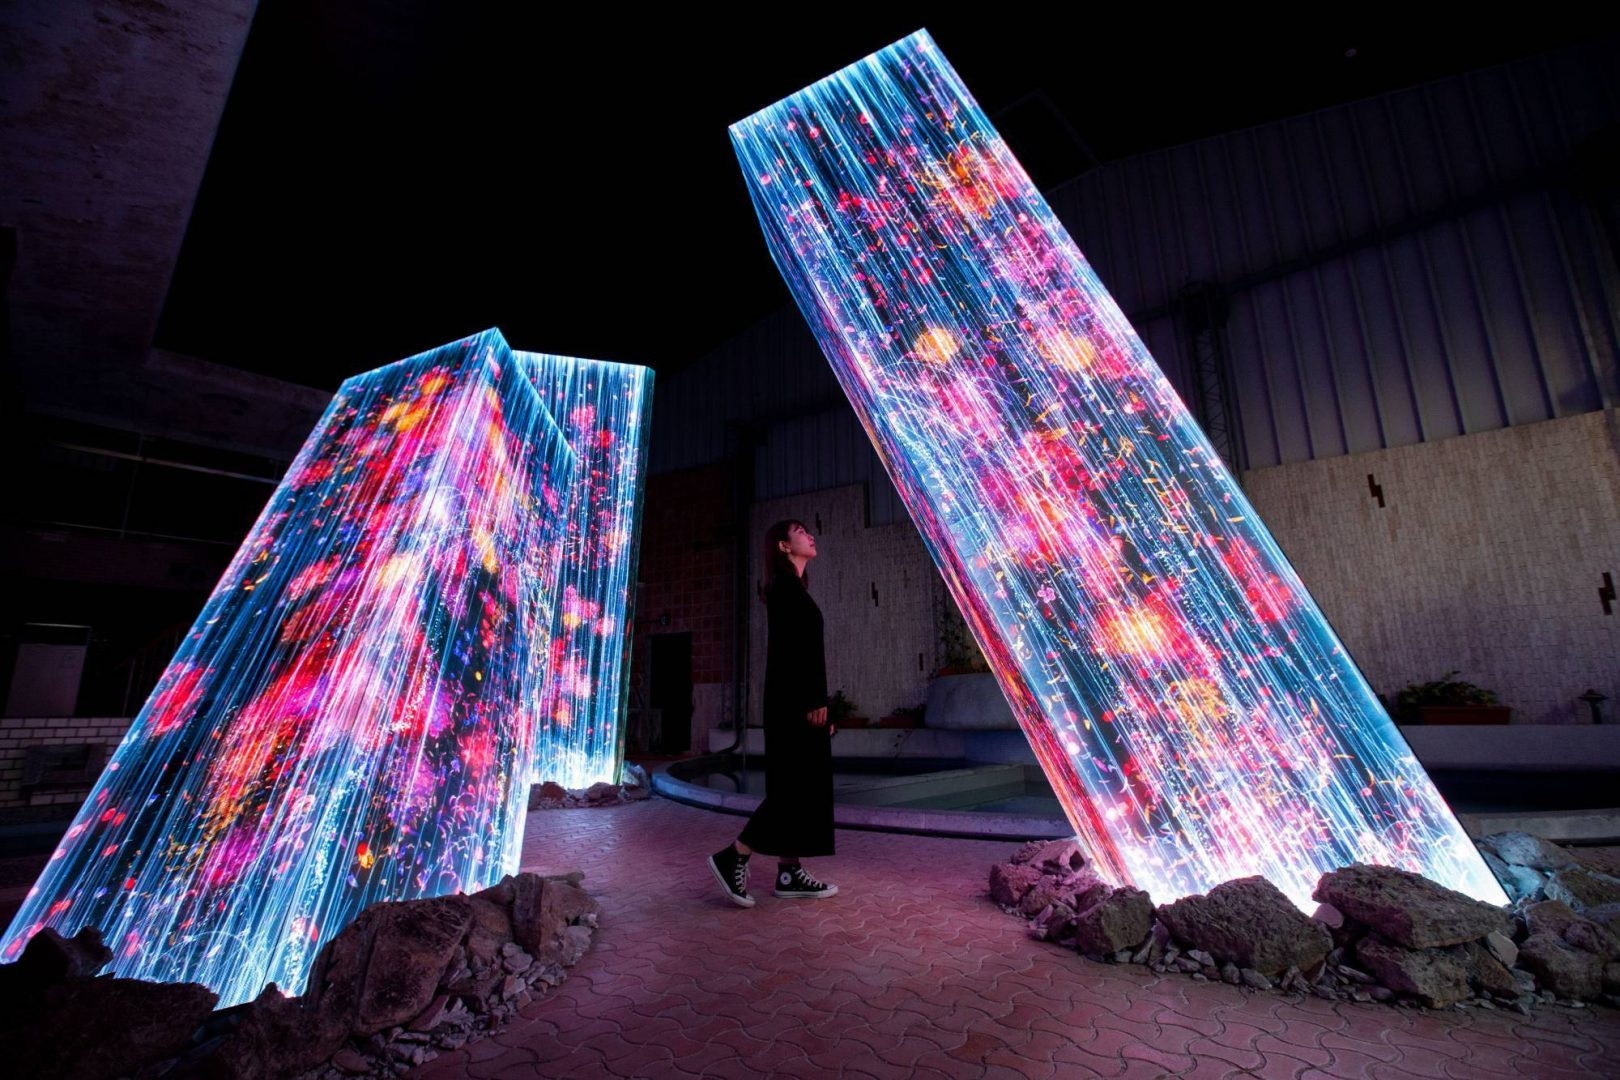 Teamlab installation Megalith dans des thermes